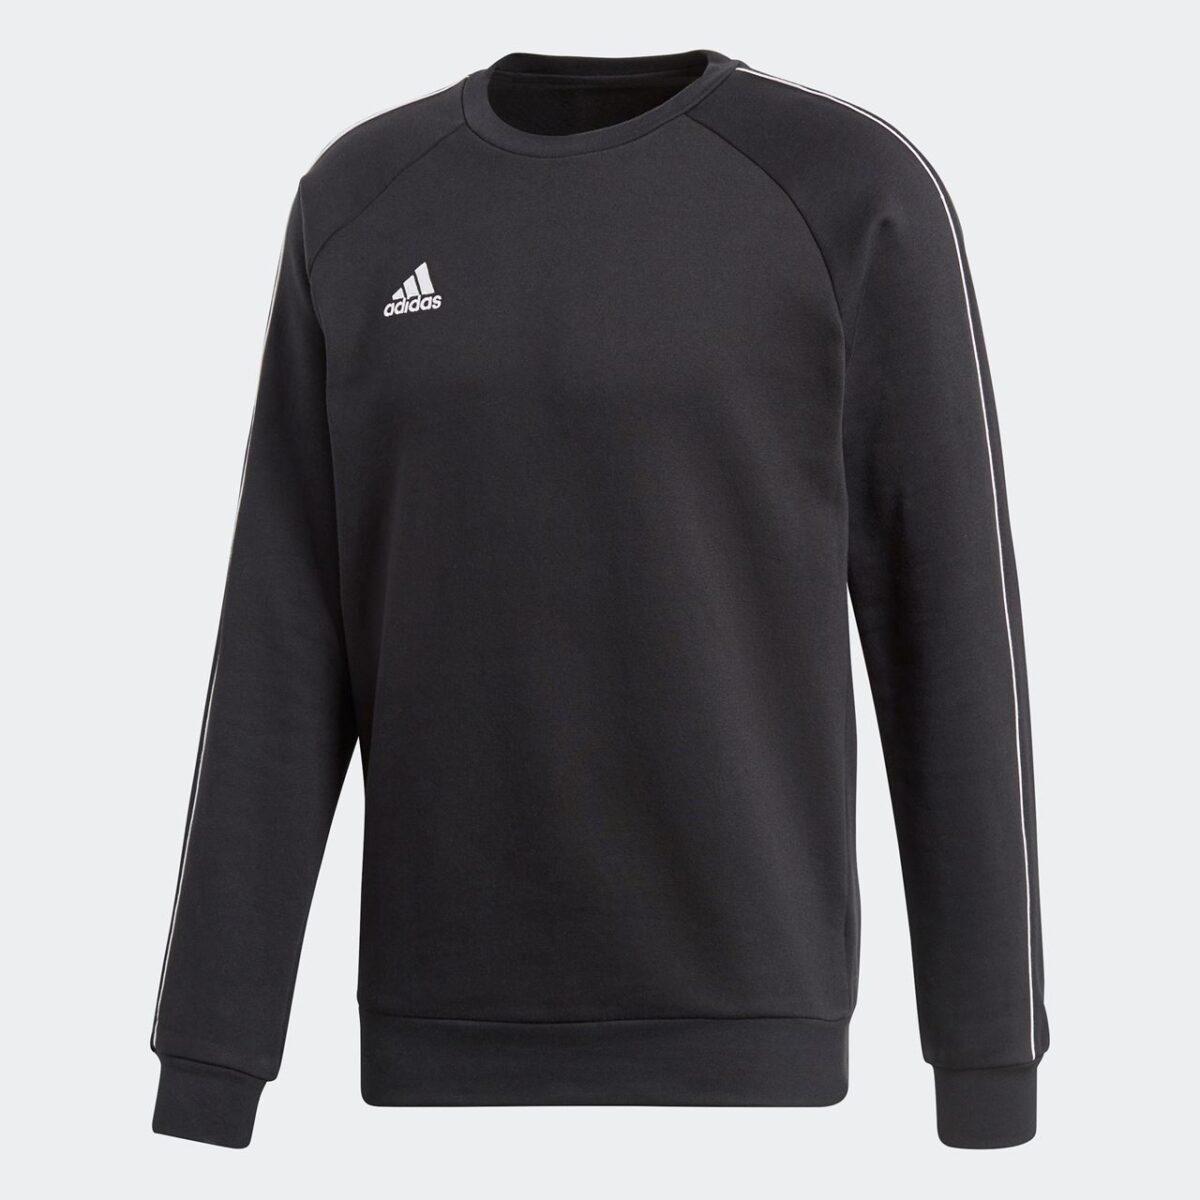 Adidas Core 18 Sweat Top Adult